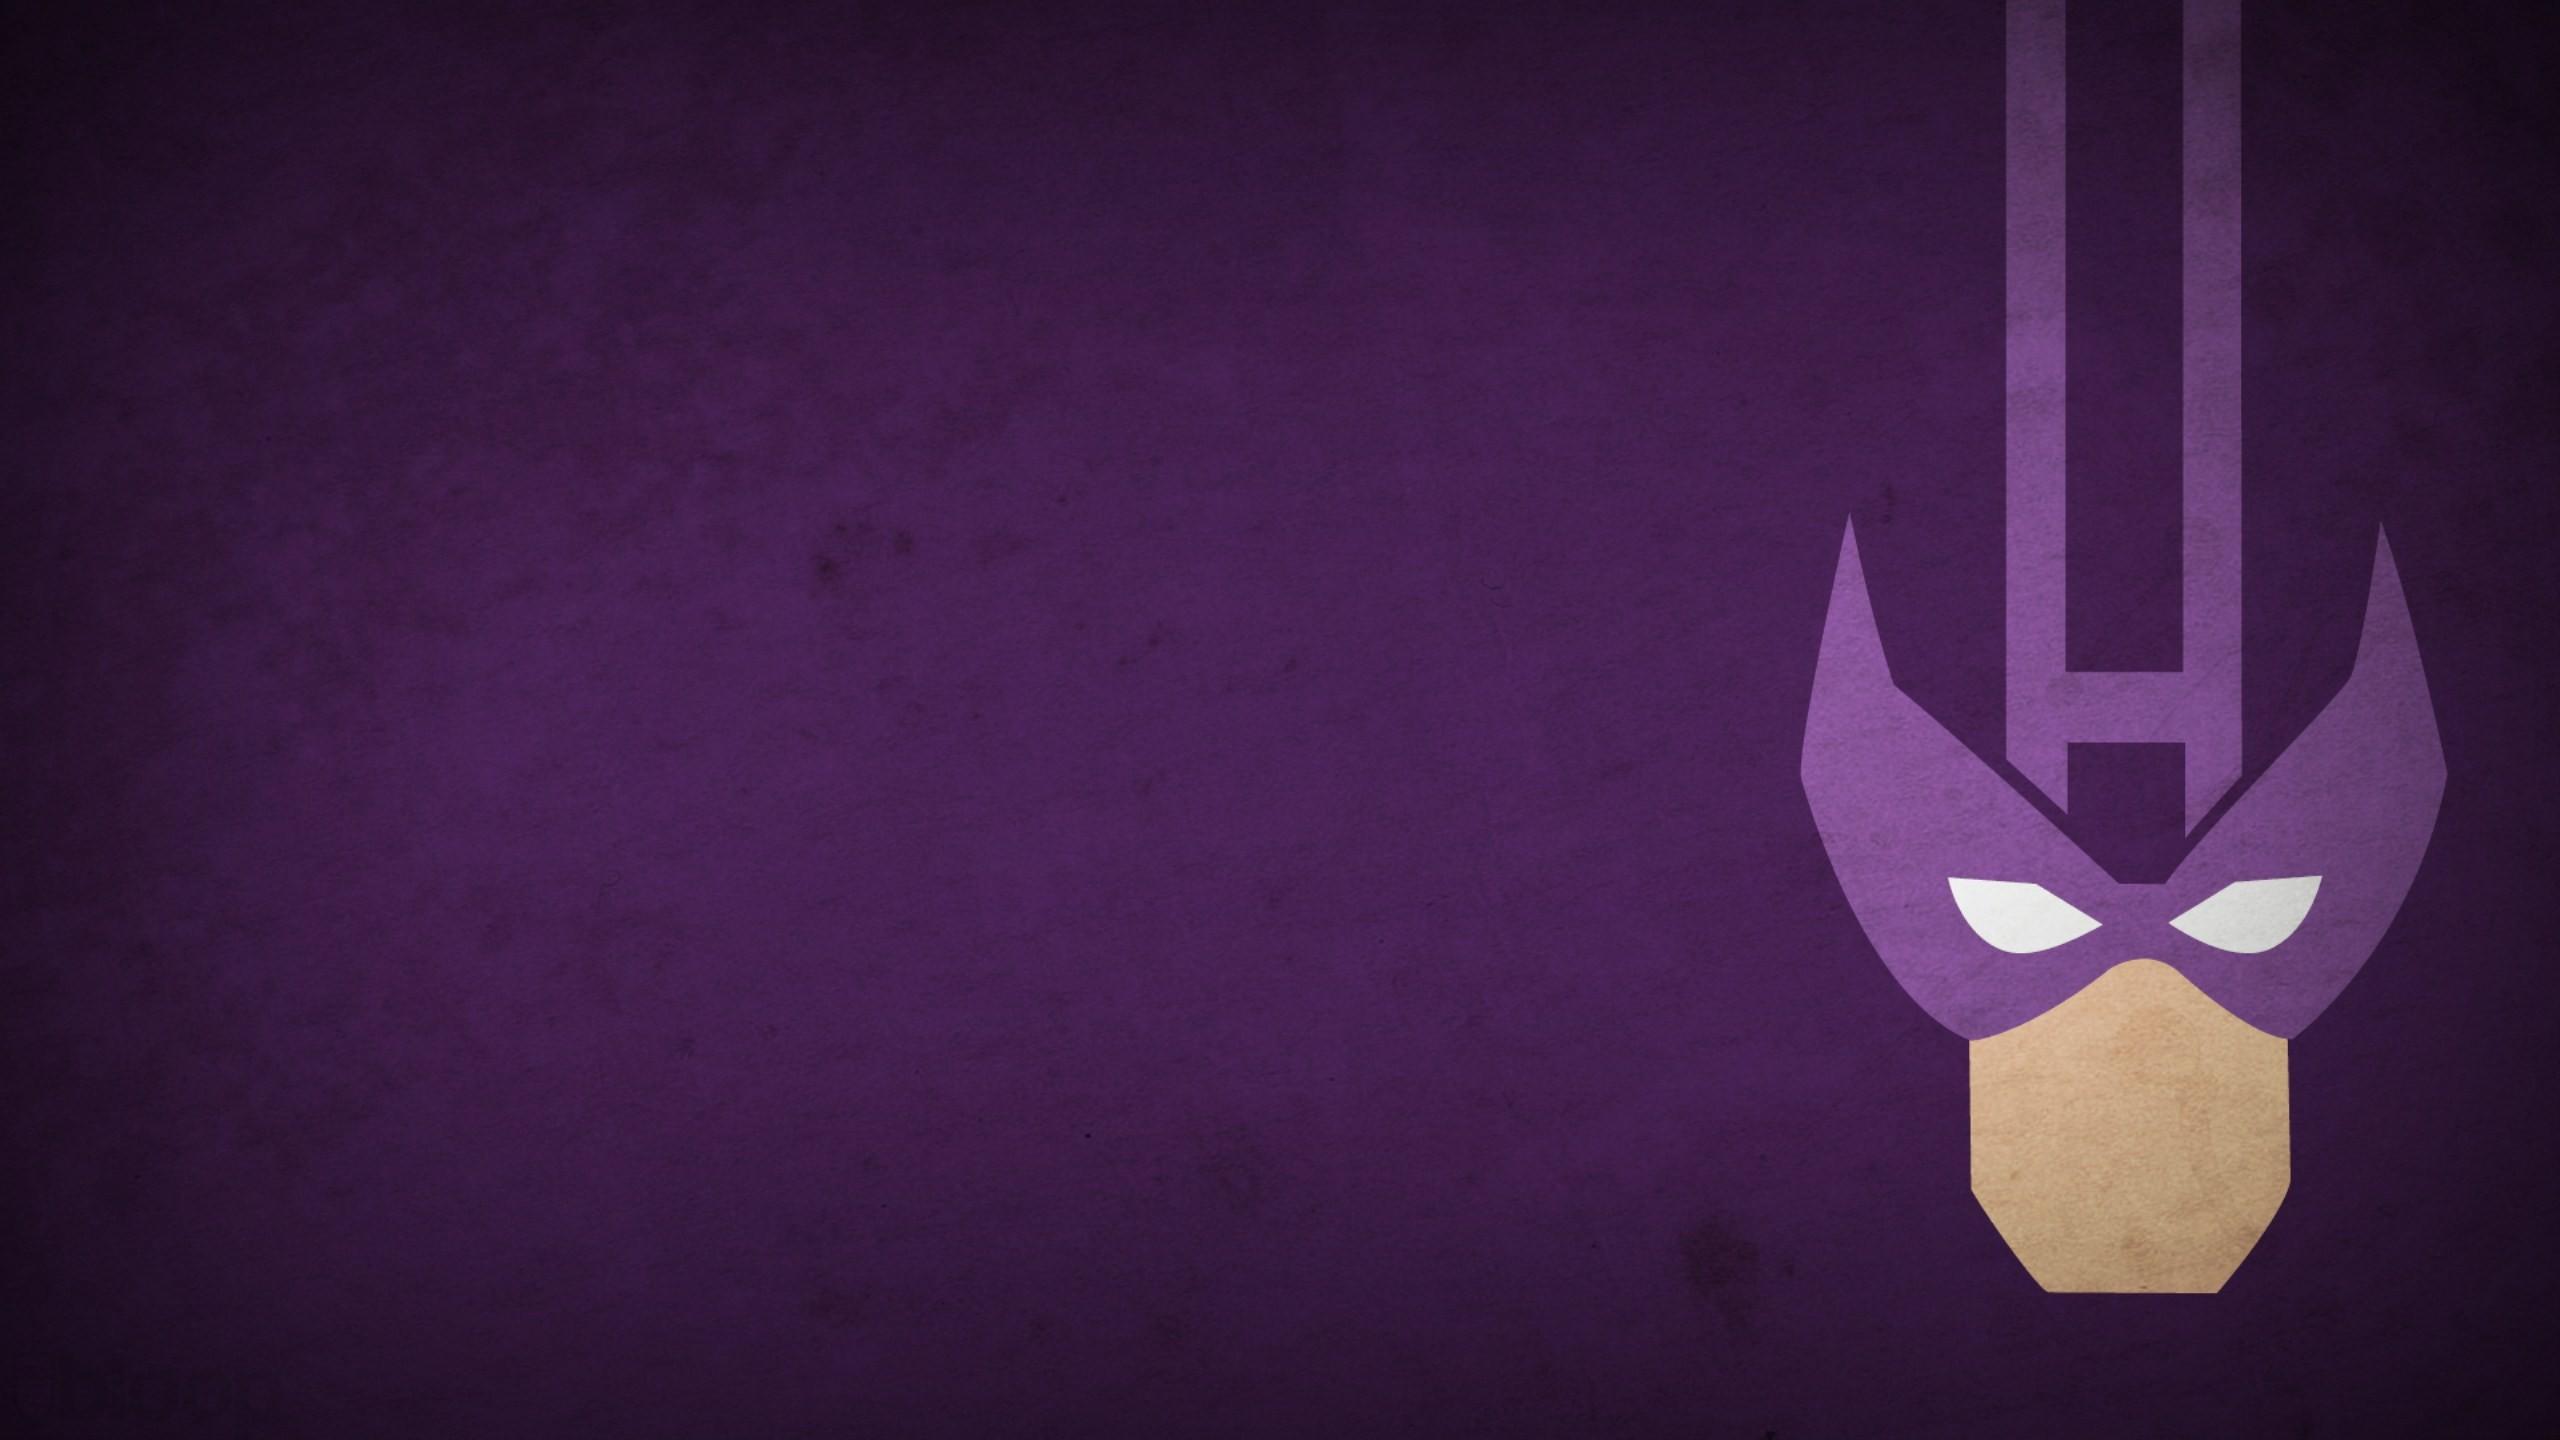 Minimalistic Marvel Comics Hawkeye purple background blo0p 2560x1440